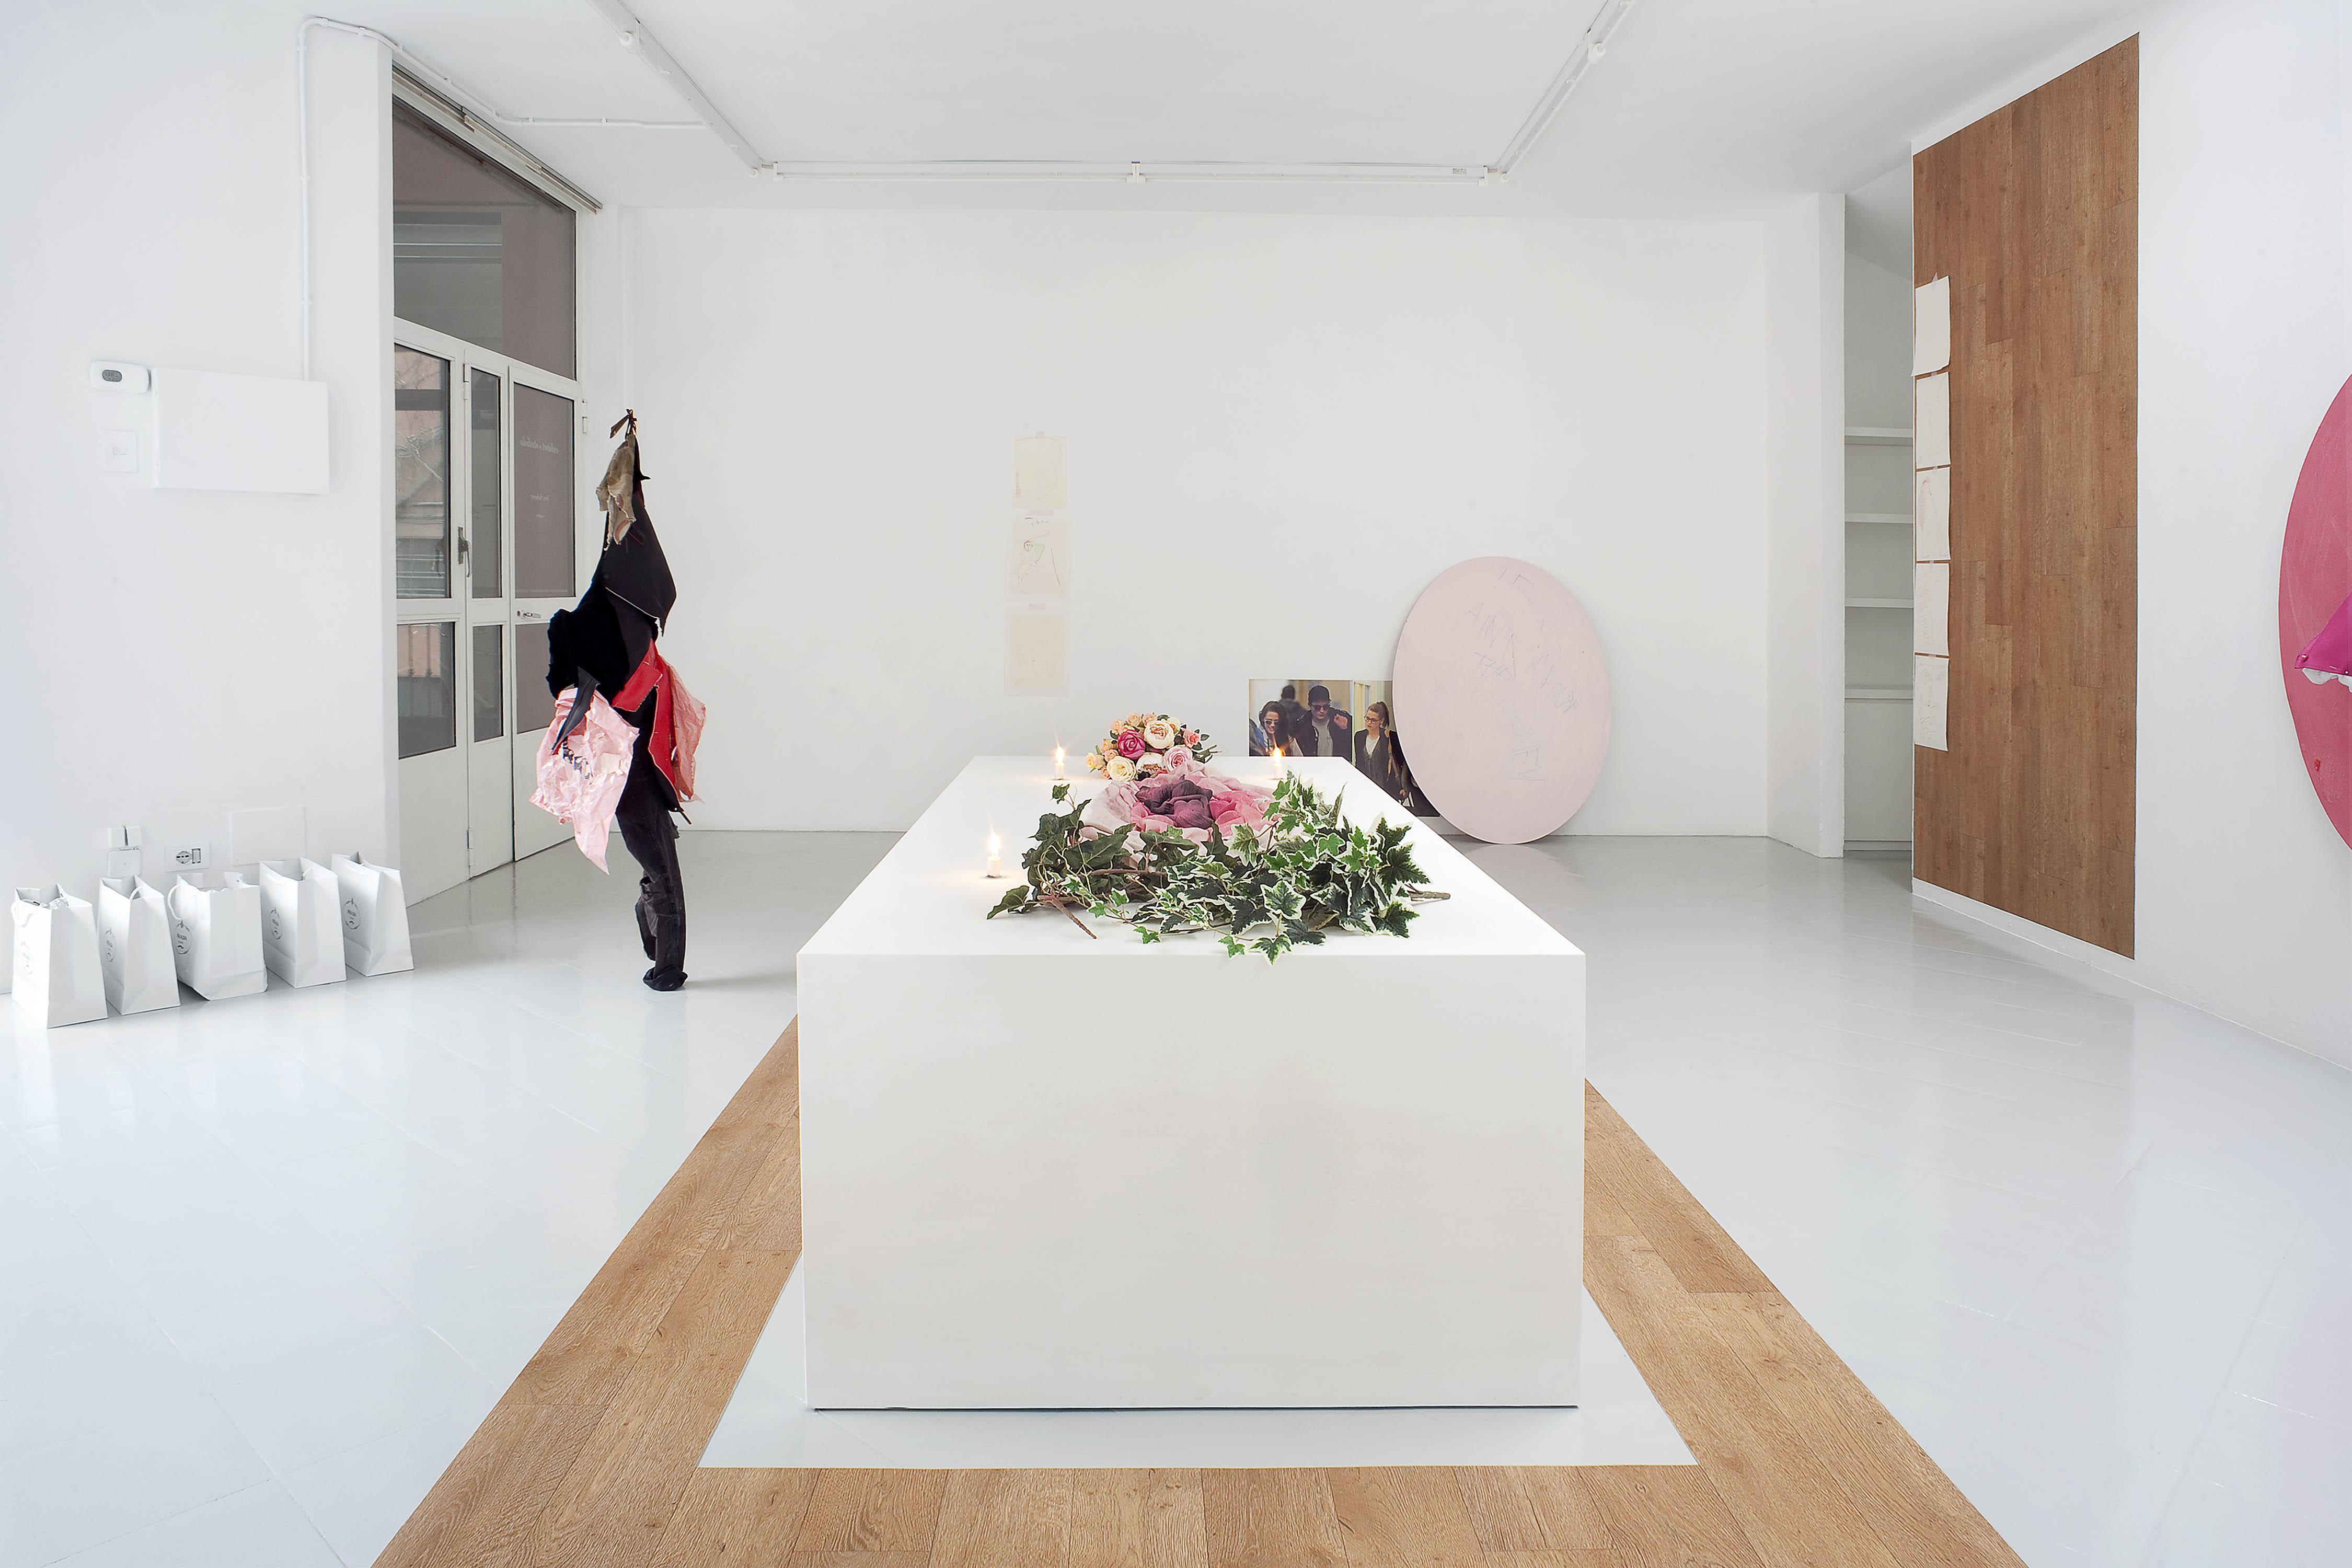 16 - Yves Scherer Installation view 2015 - Courtesy Studiolo Milan - Photo Filippo Armellin